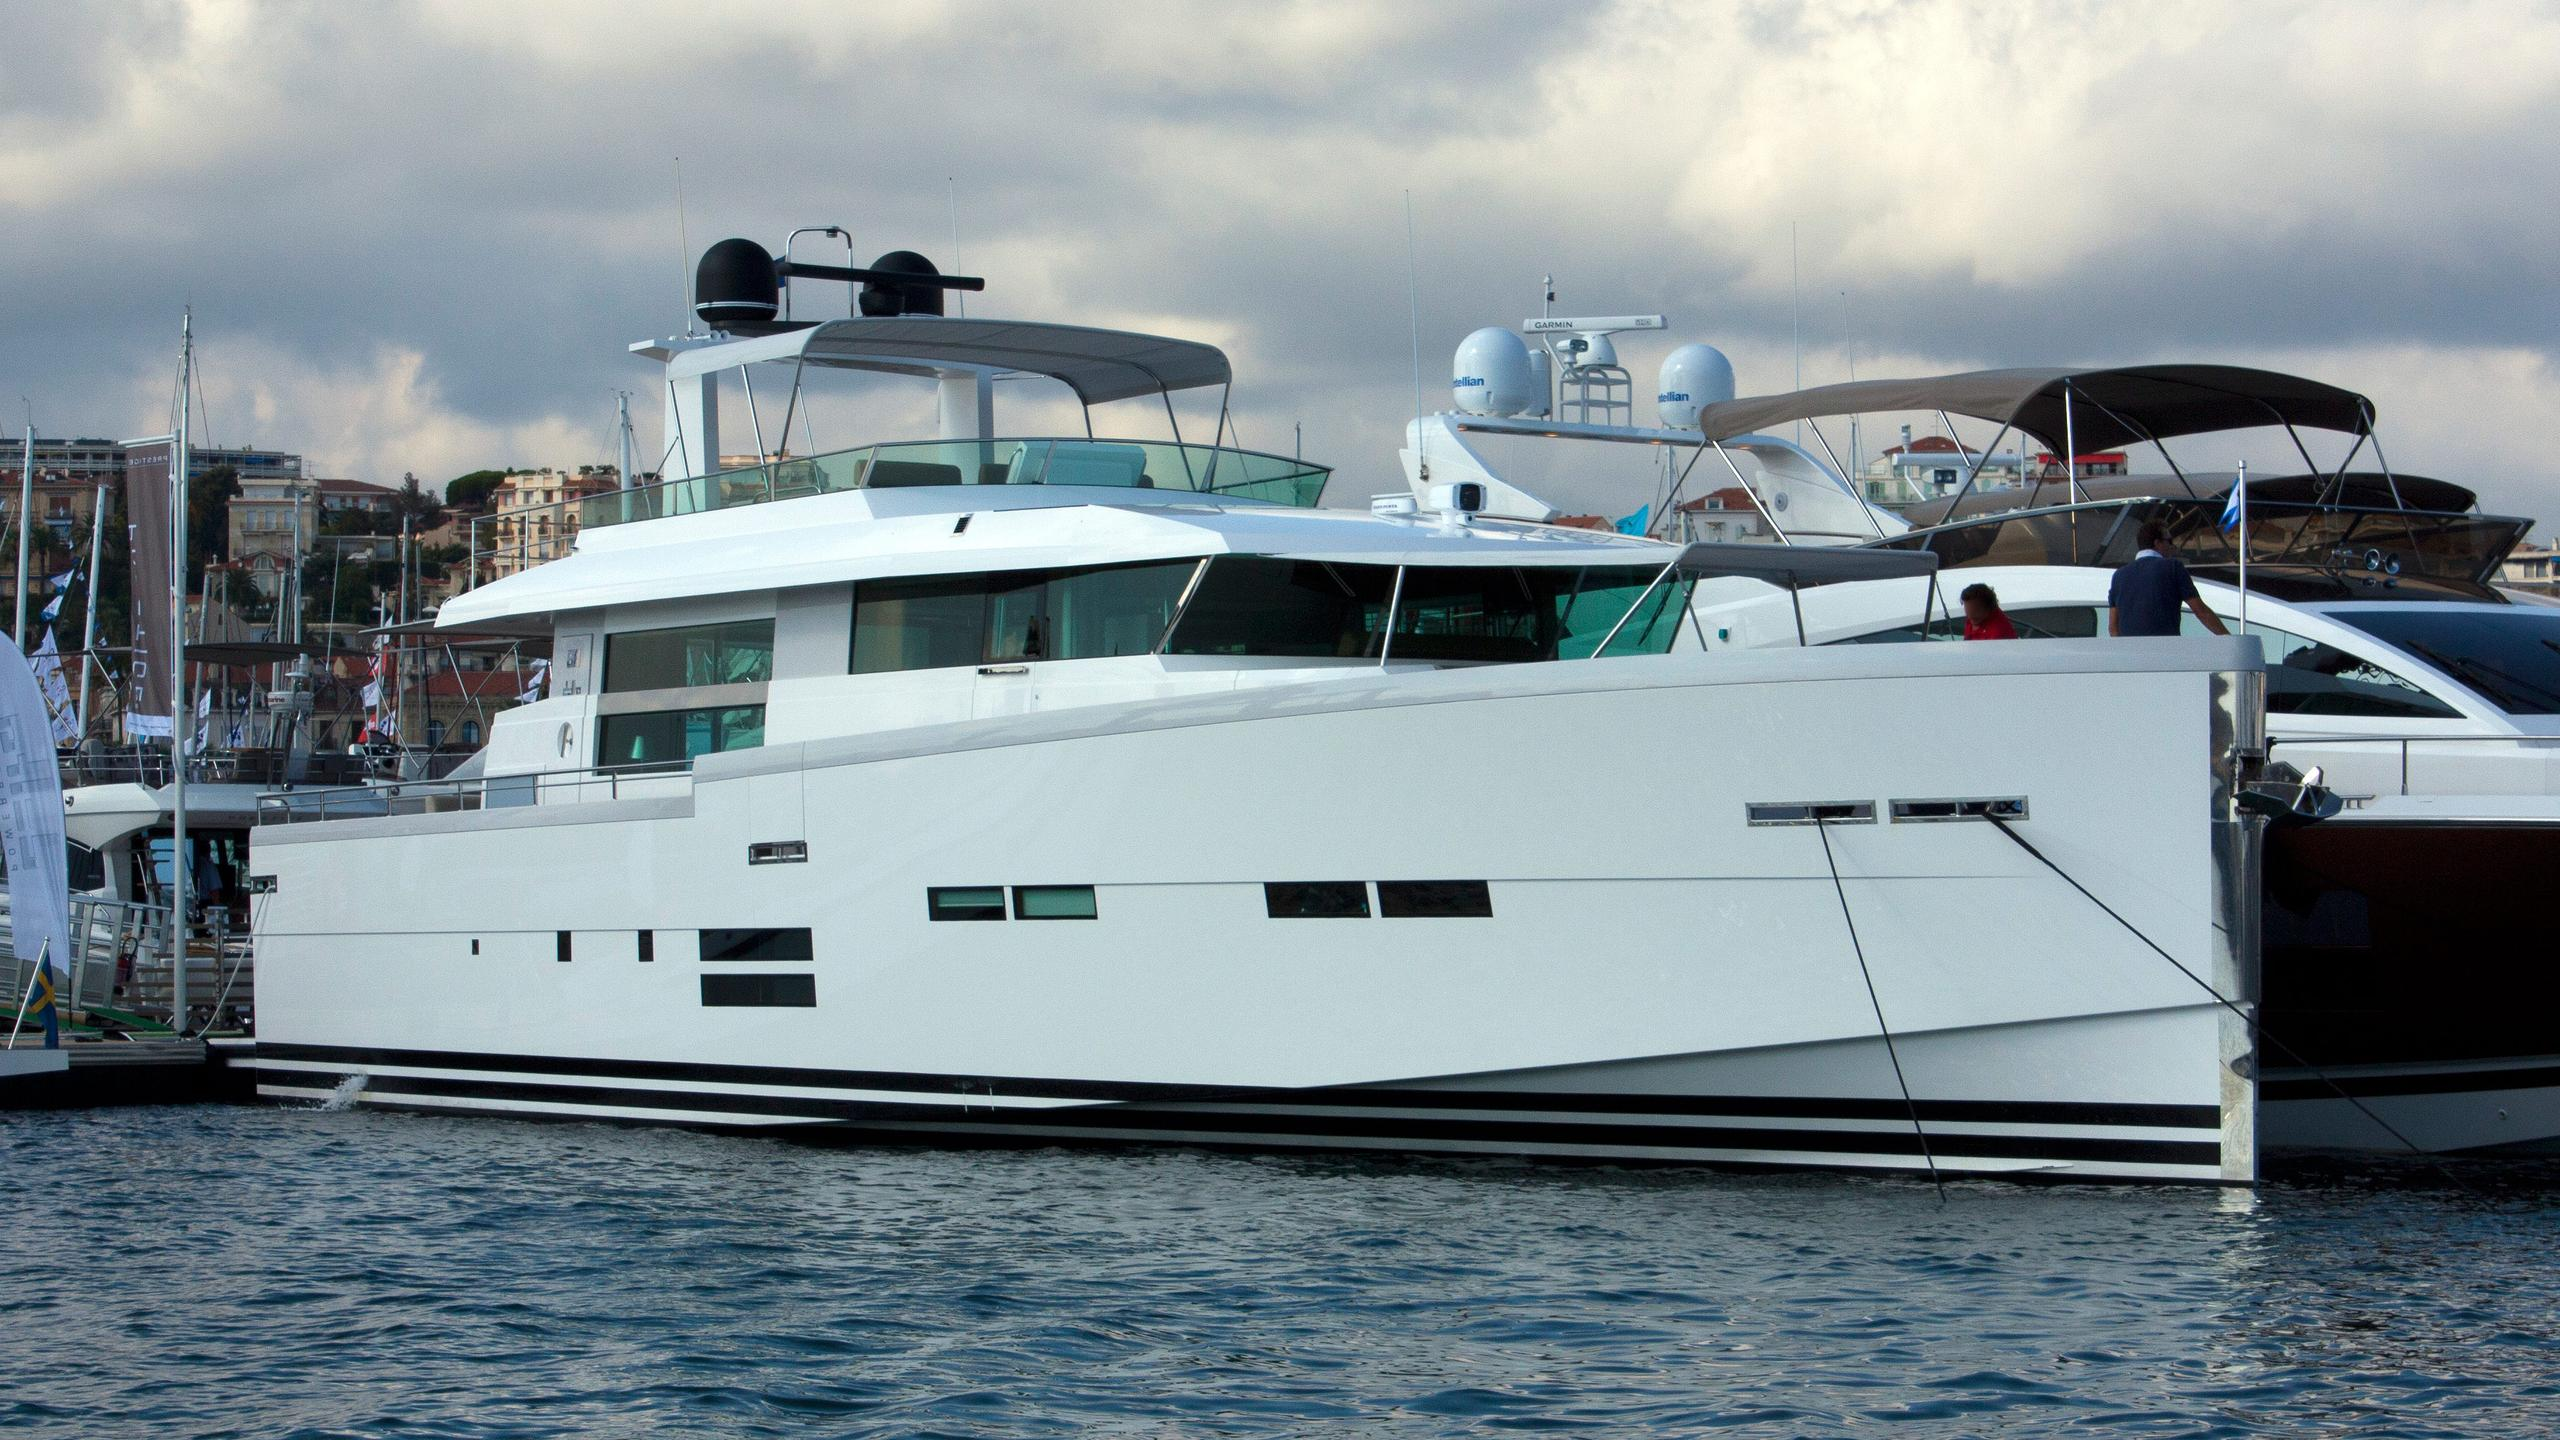 samisa-motor-yacht-delta-powerboats-2014-26m-moored-half-profile